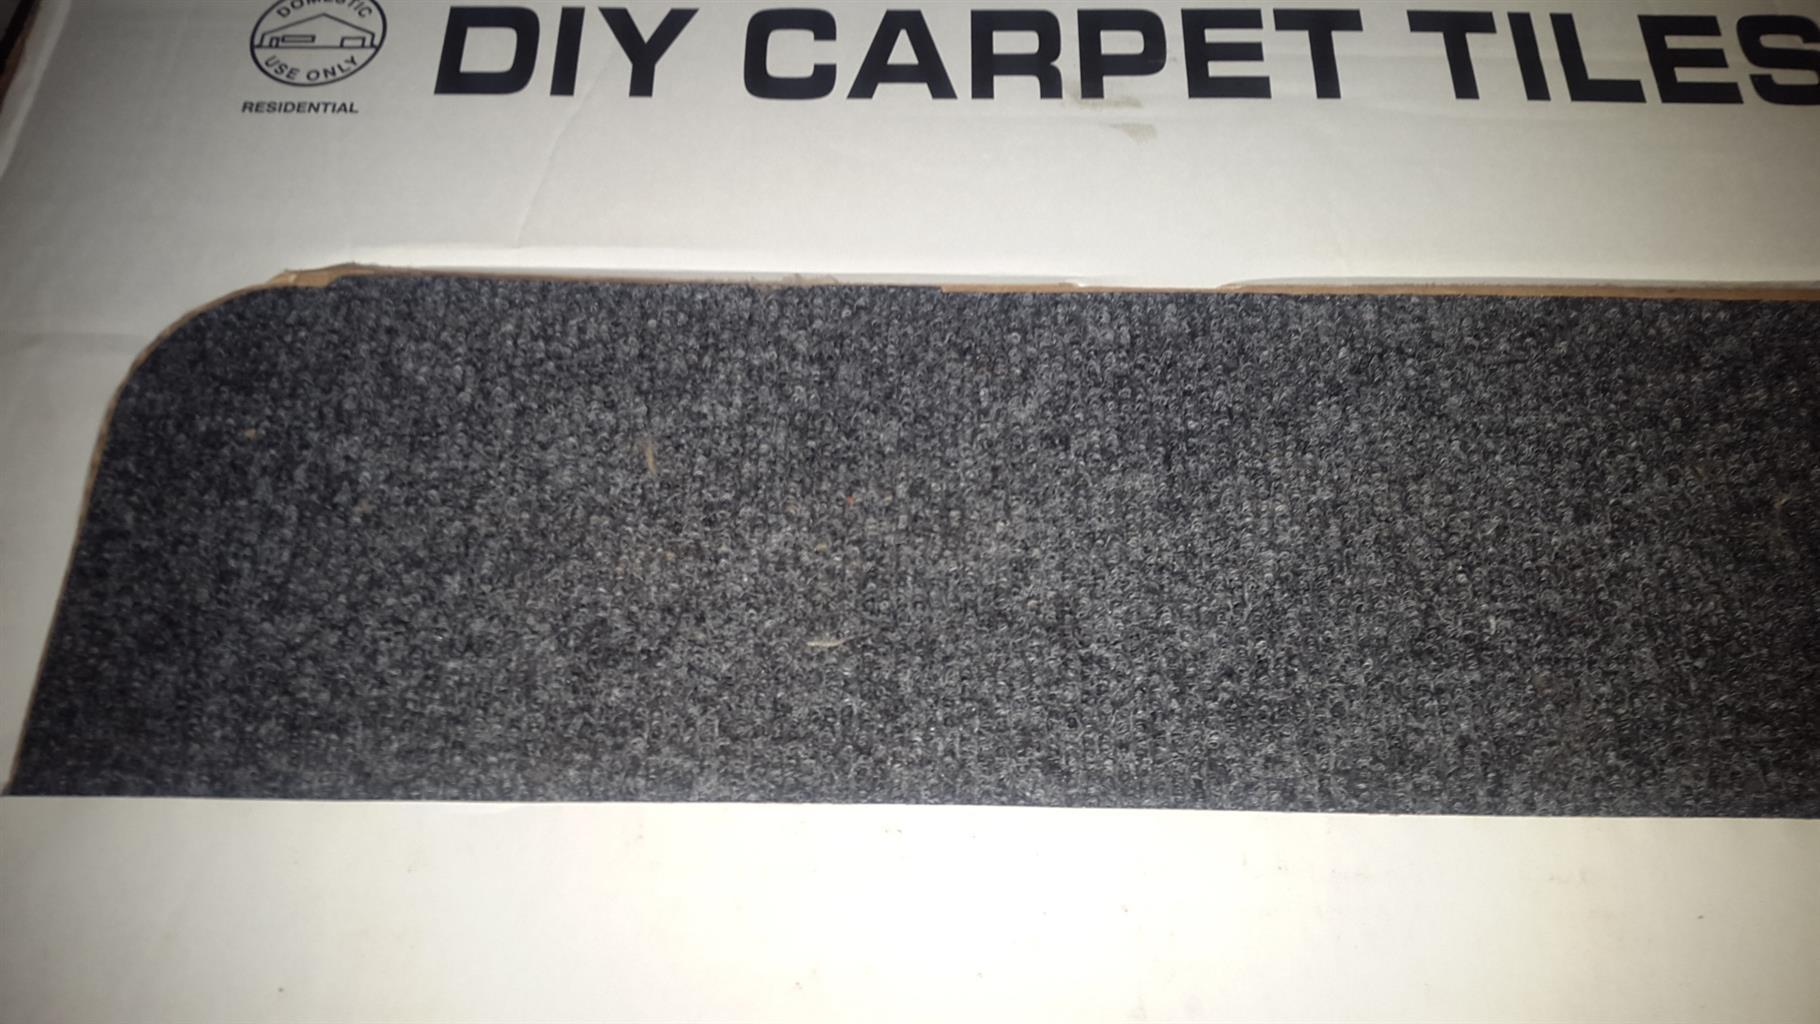 DIY CARPET TILES